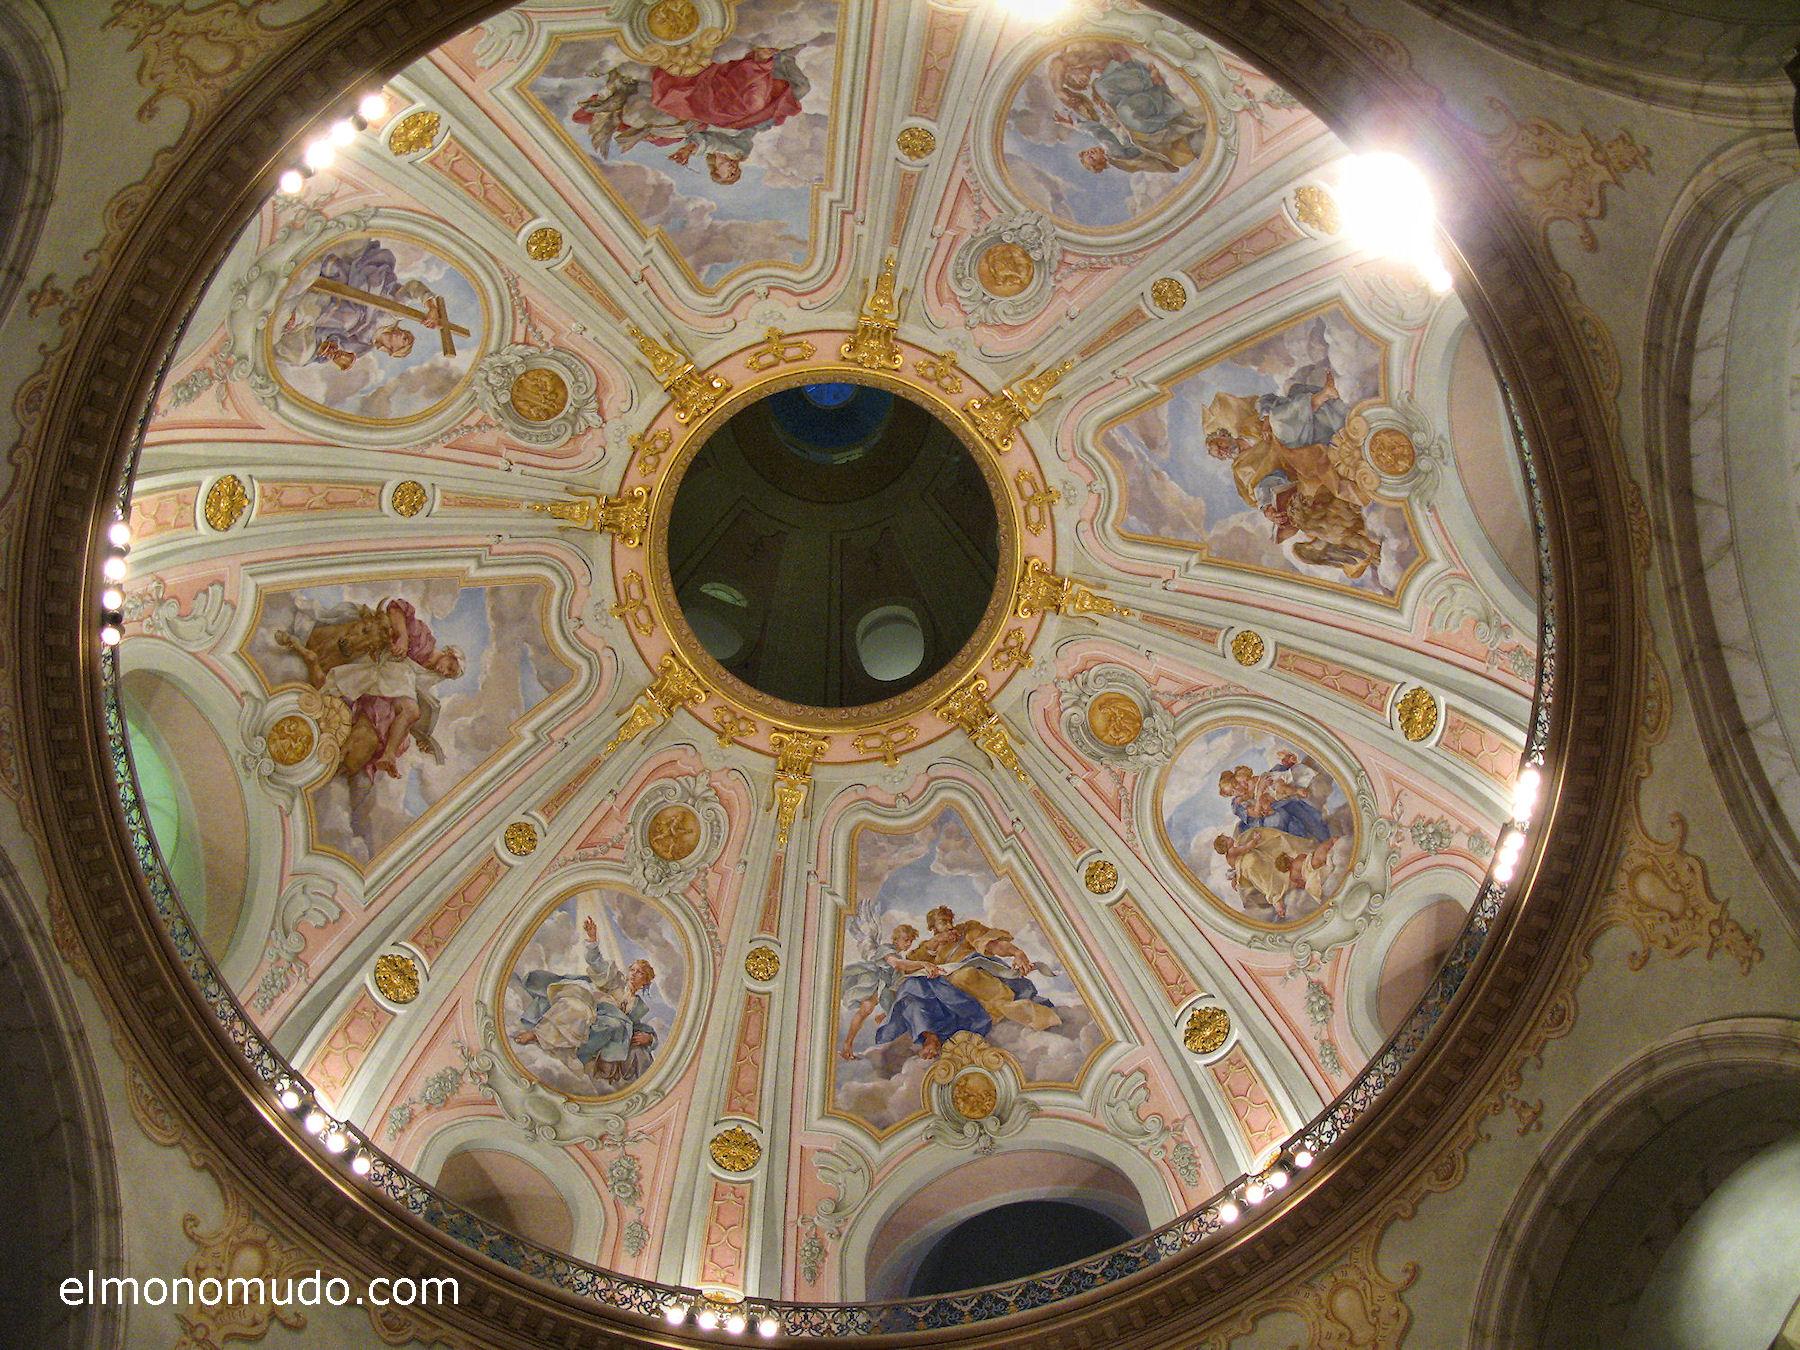 frauenkirche-interior-cupula